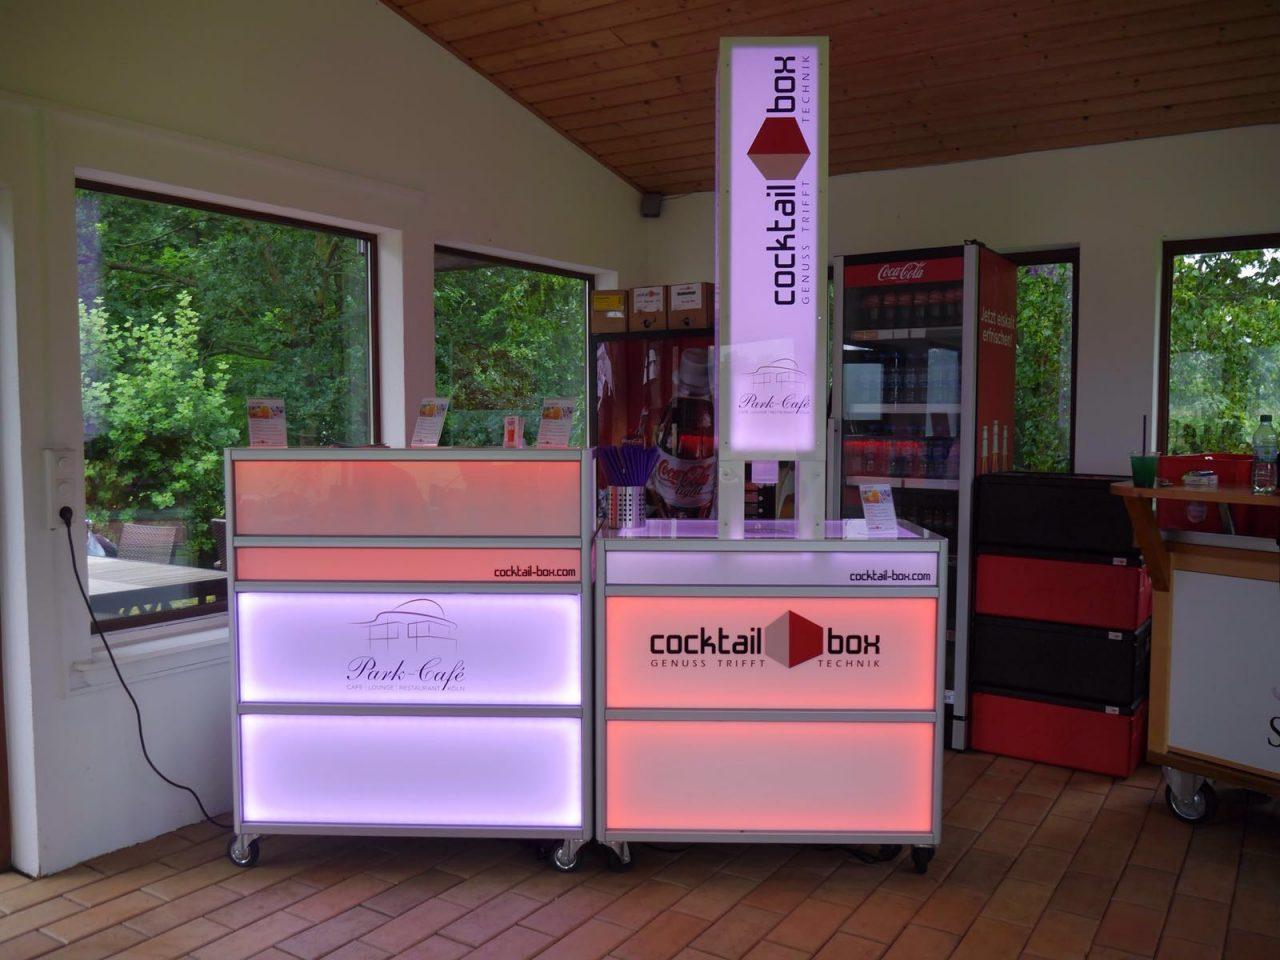 cocktail-box_8886